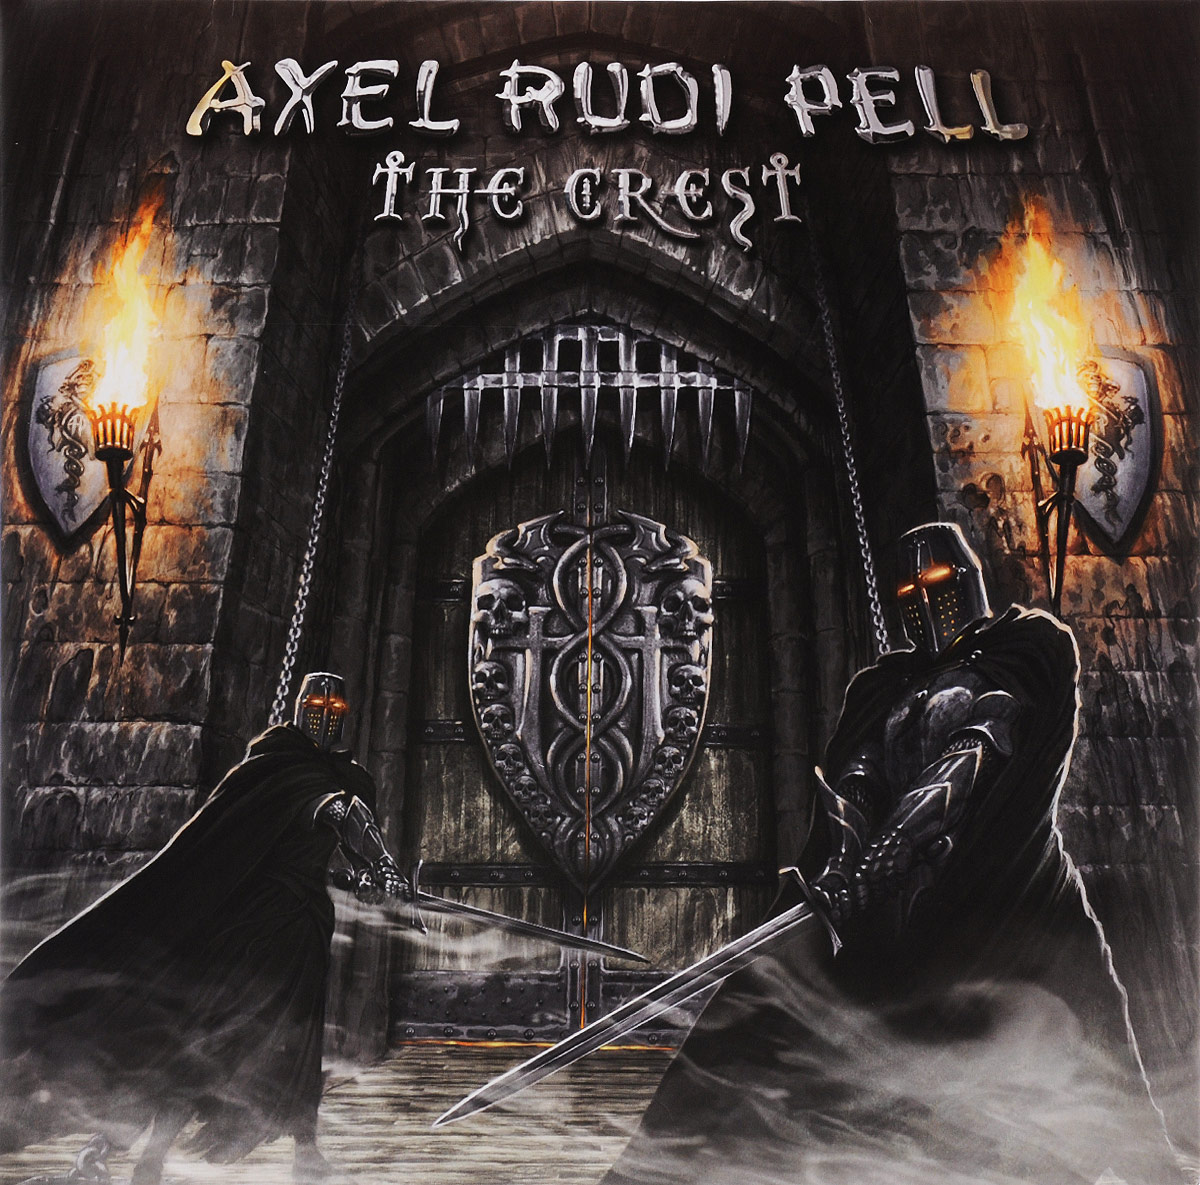 Аксель Руди Пелл Axel Rudi Pell. The Crest (2 LP) axel rudi pell knight treasures live and more 2 dvd